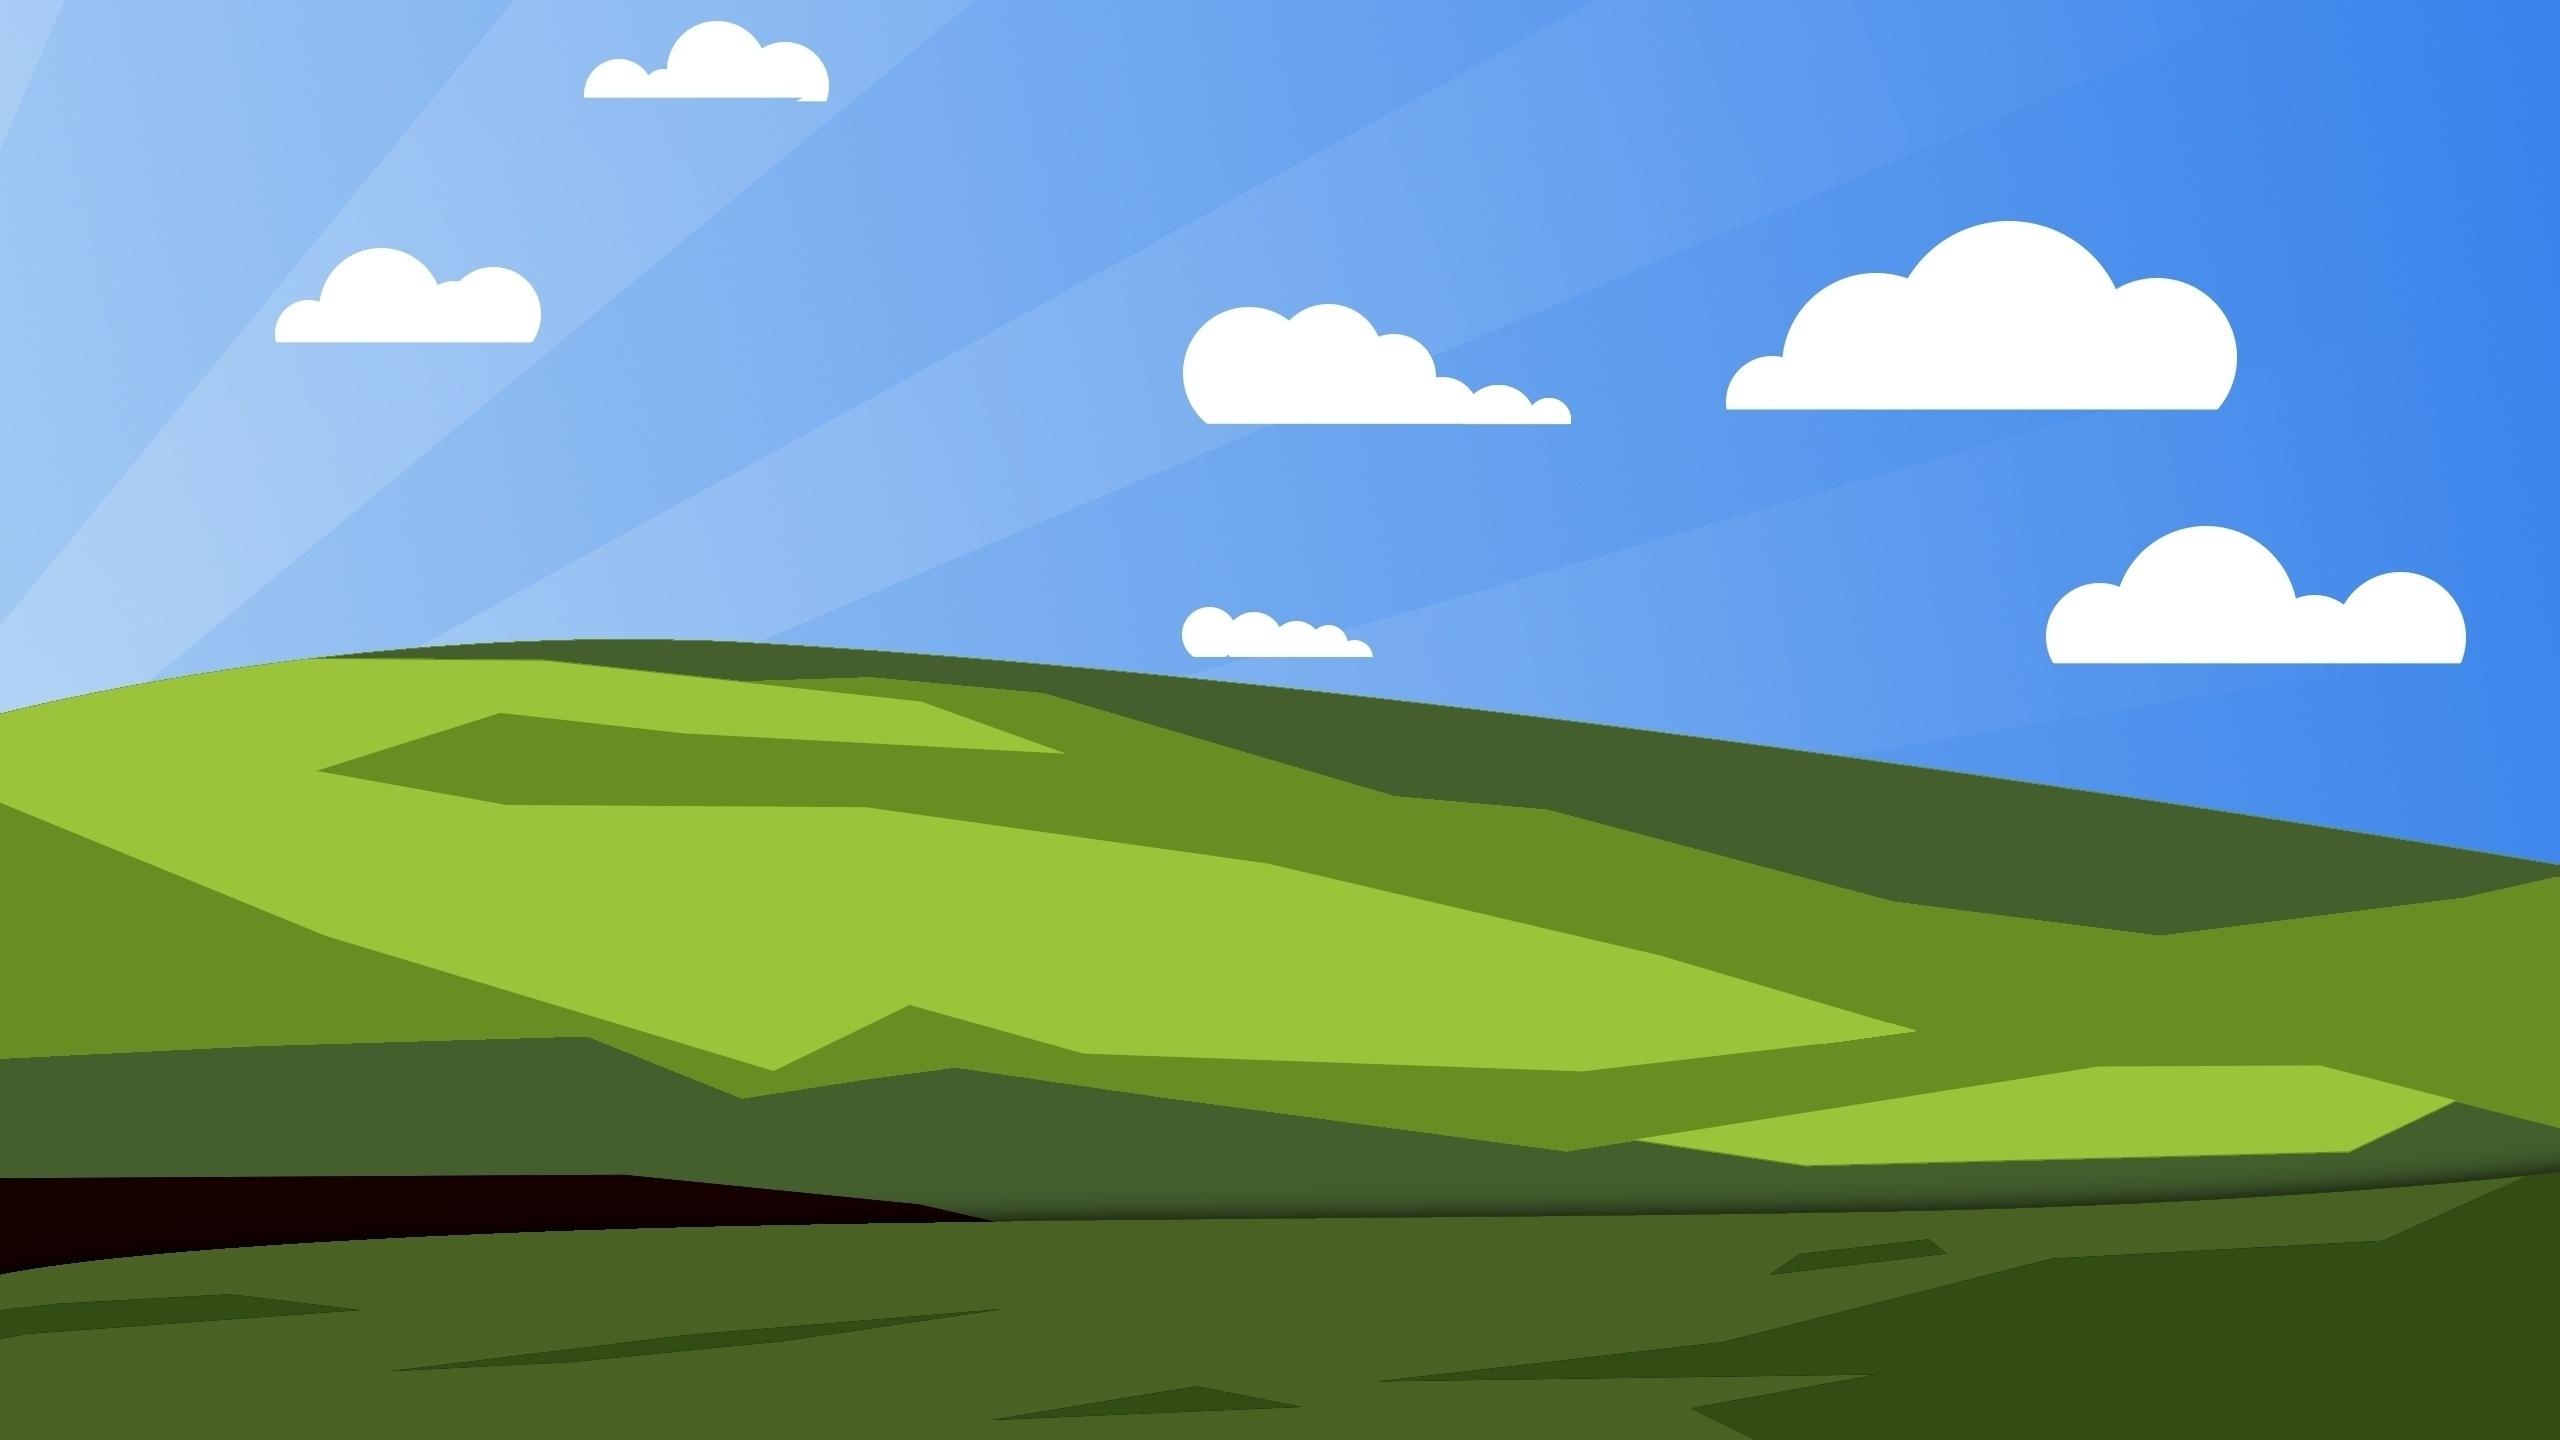 Xp Windows Vector Wallpaper Hd Vector 4k Wallpapers Images